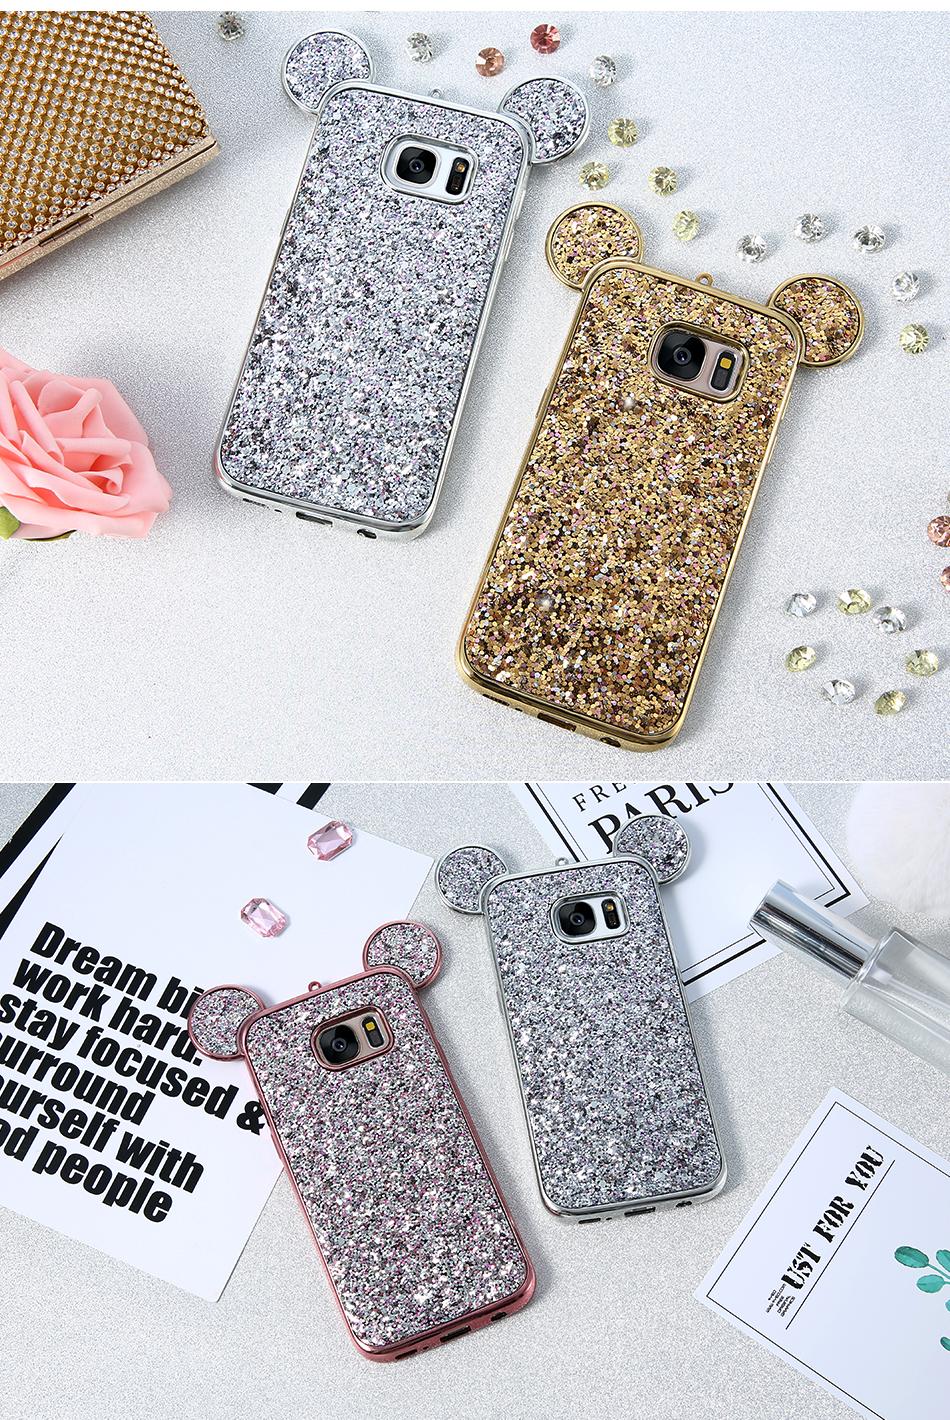 Корпус для KISSCASE Samsung Galaxy S8 Plus S6 S7 Edge Mickey Mouse Плакировочная рамка edge Edge|case for samsung Glitter TPU Case 023 (4)